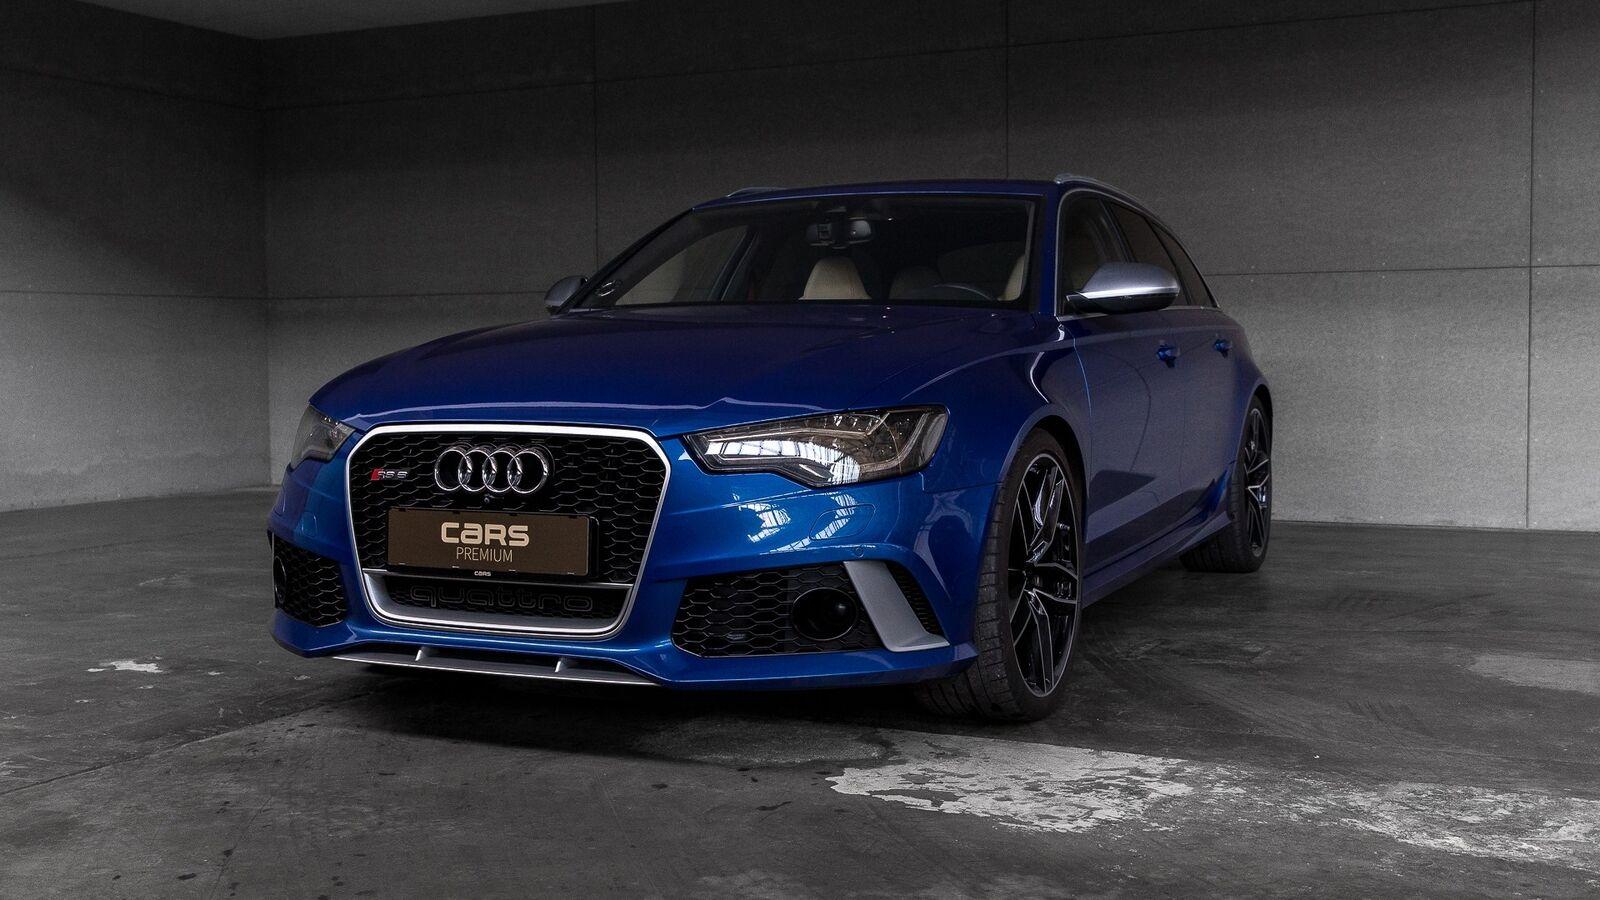 Audi RS6 4,0 TFSi Avant quattro Tiptr. 5d - 5.418 kr.